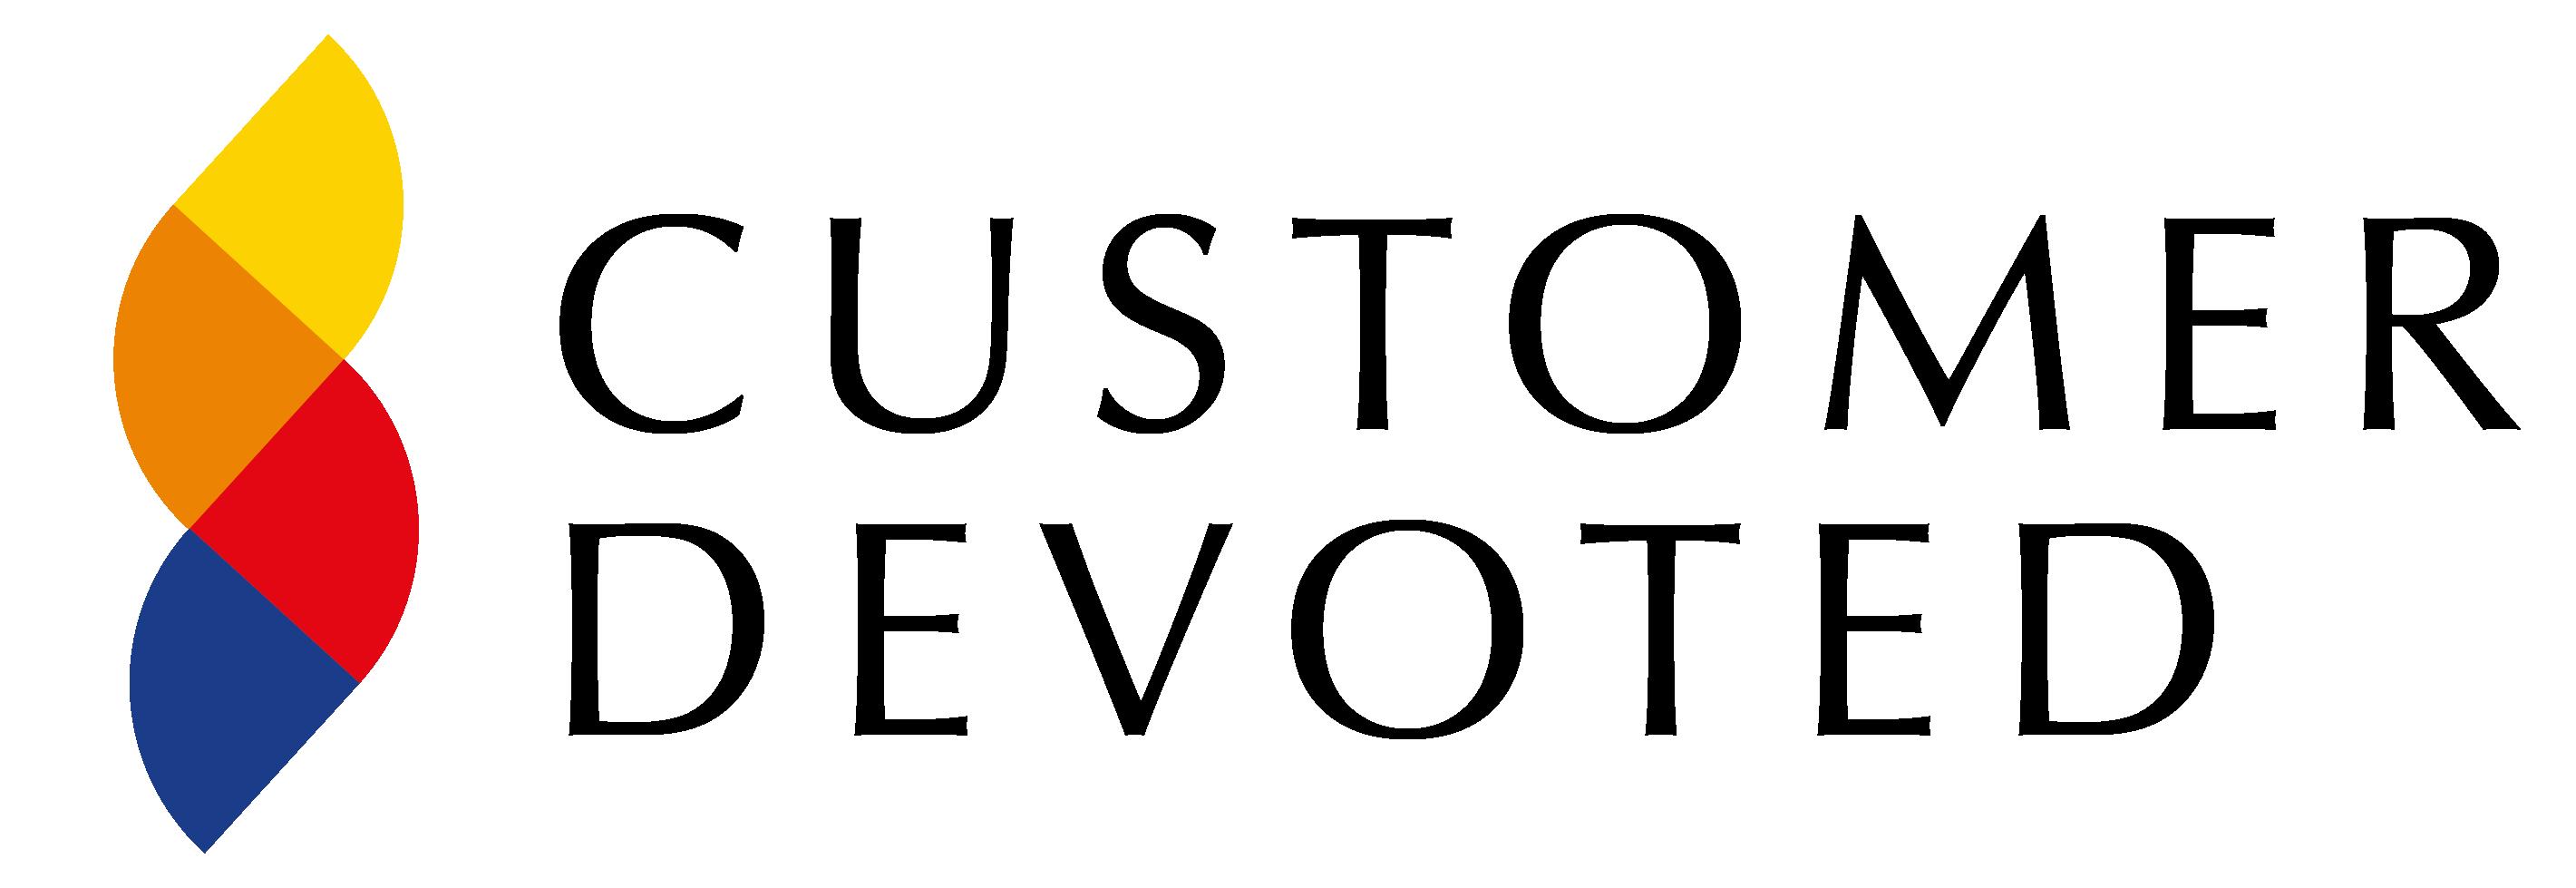 Customer Devoted Logo